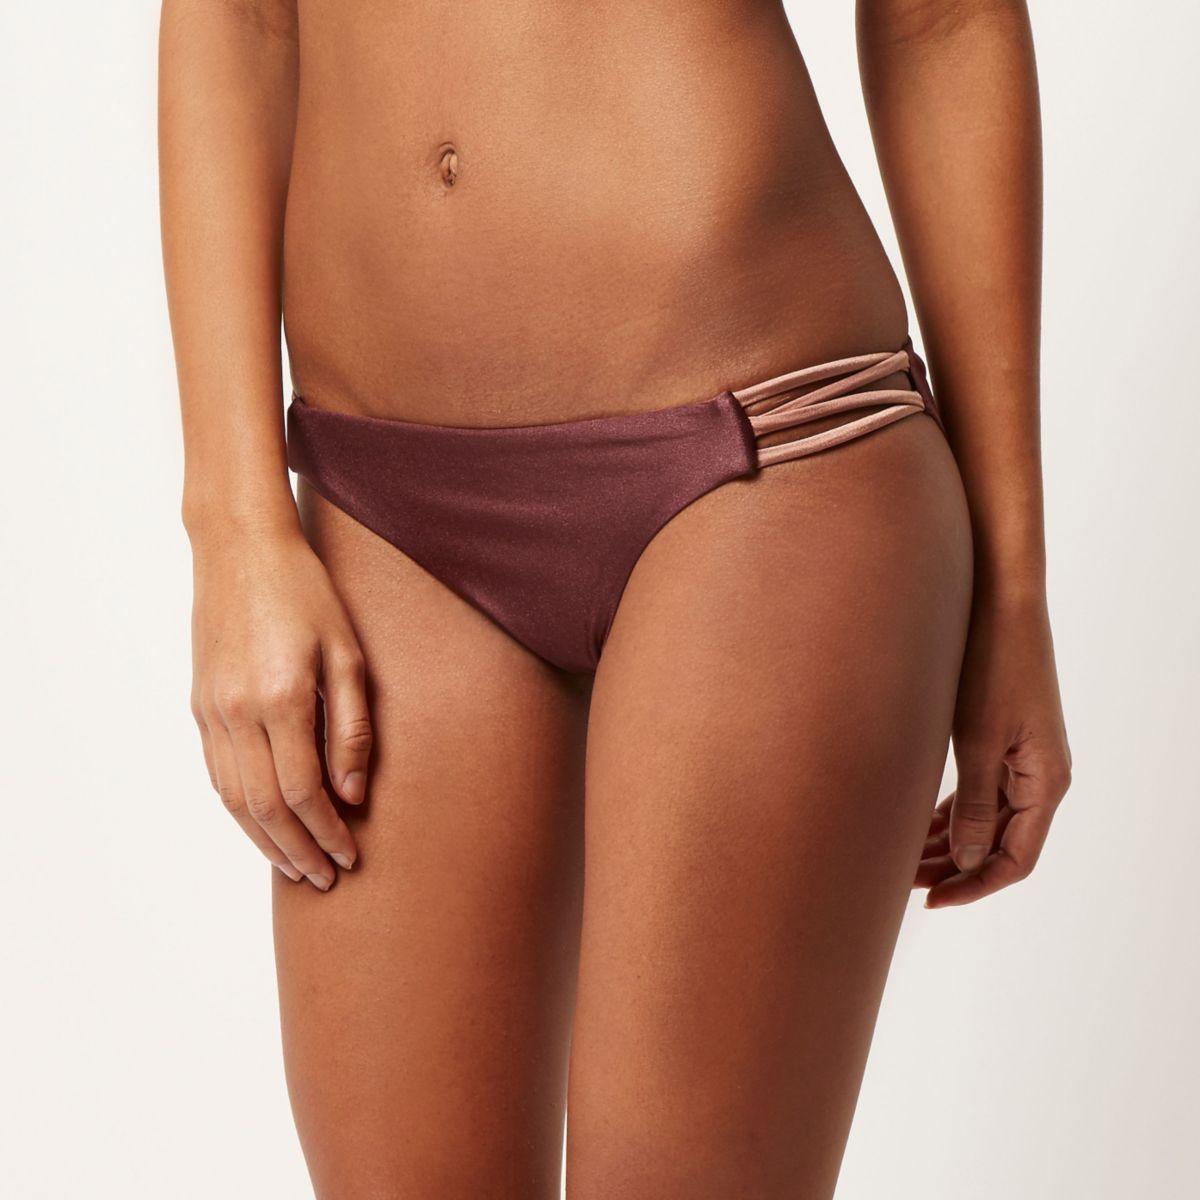 Bas de bikini taille basse marron